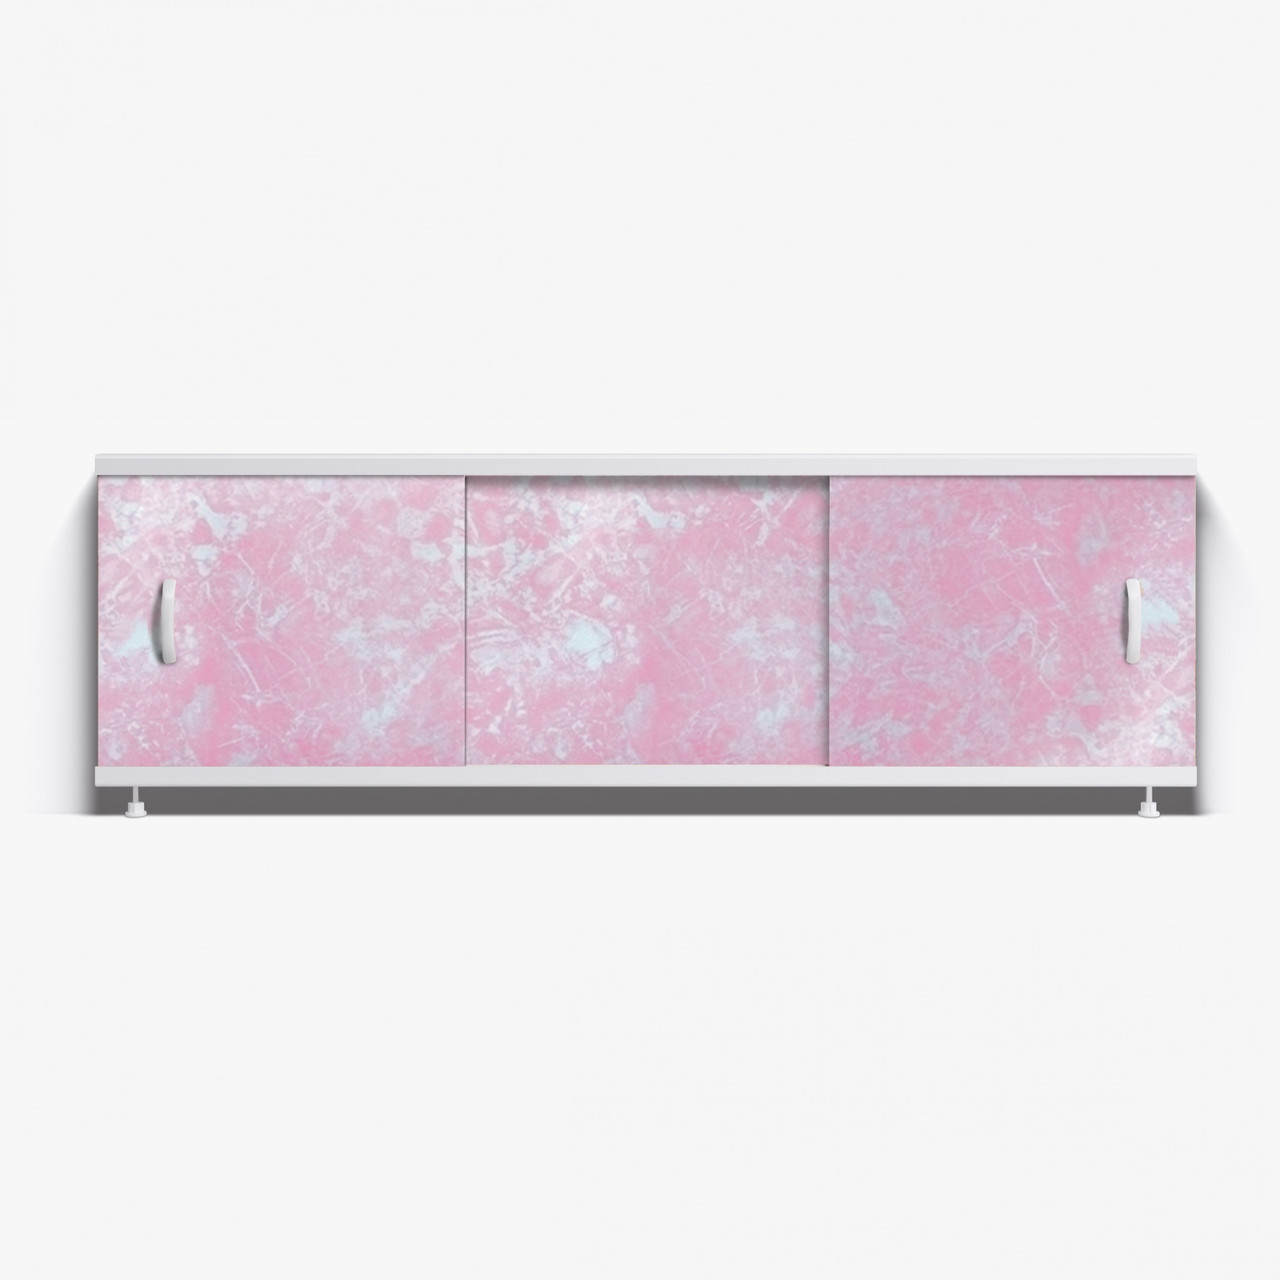 Панель для ванны Alavann ОПТИМА 1.5 м  // 1 светло-розовый мрамор